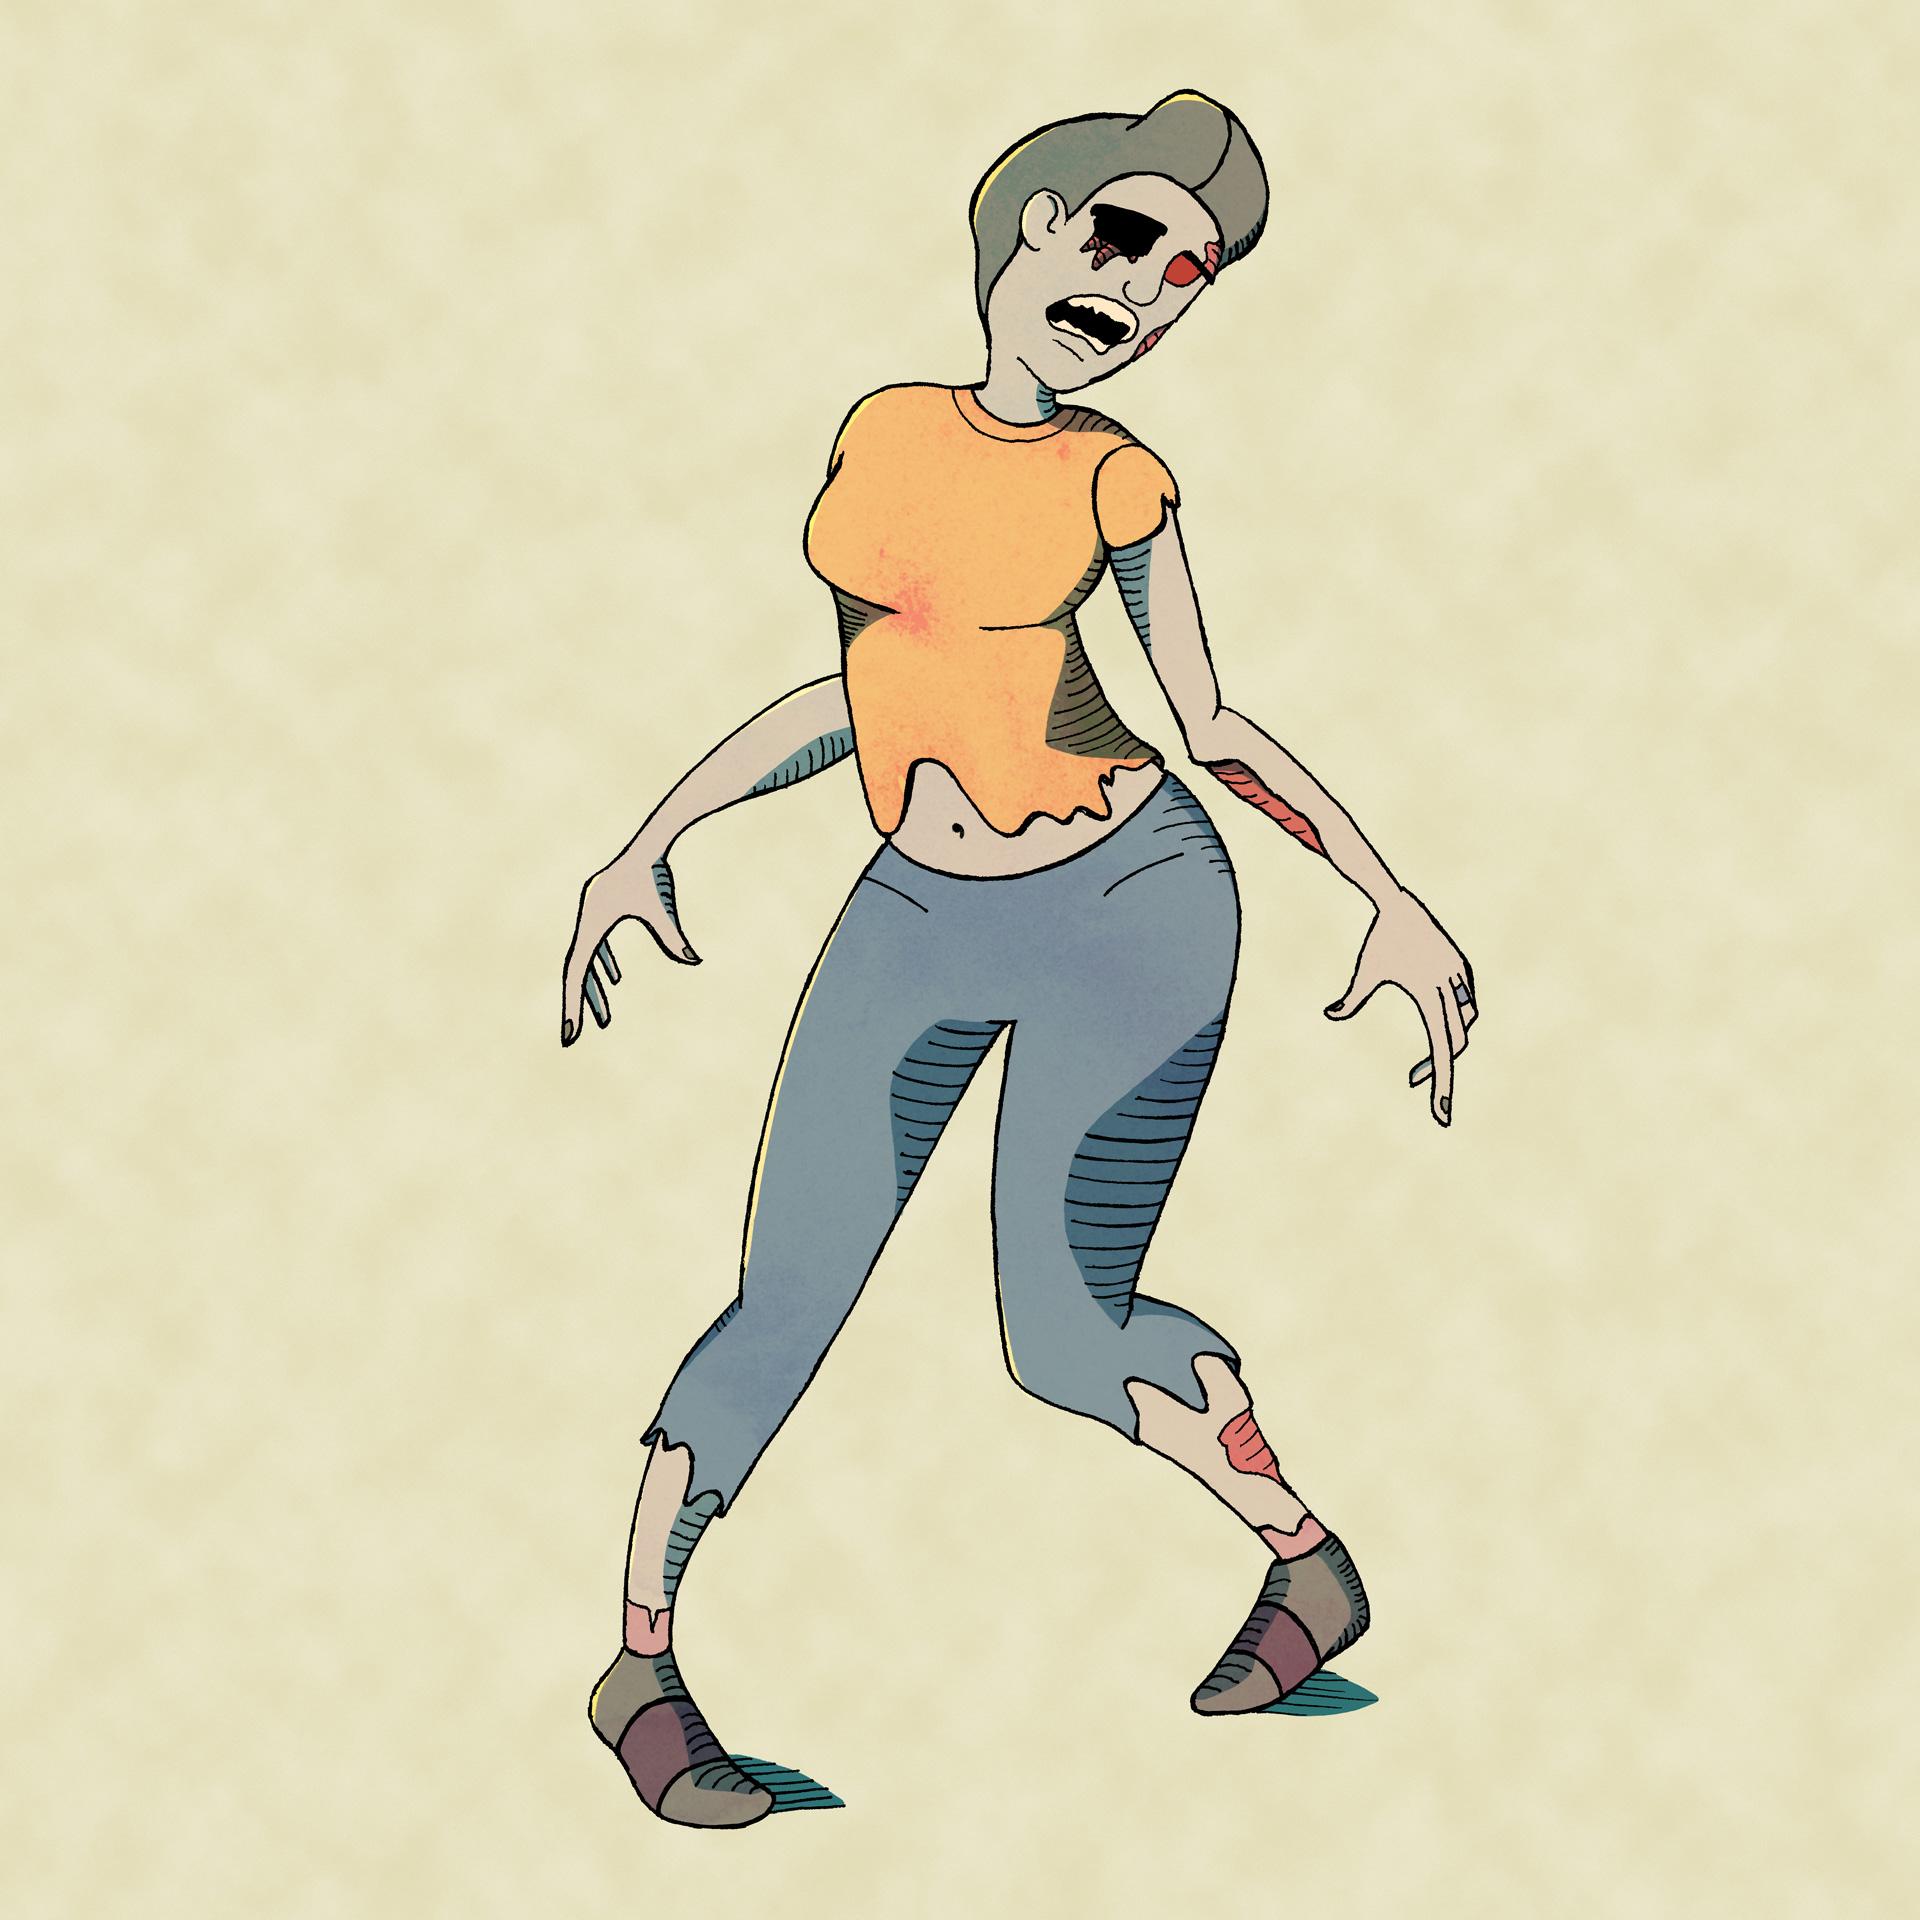 zombie-three-20180715-02-b.jpg